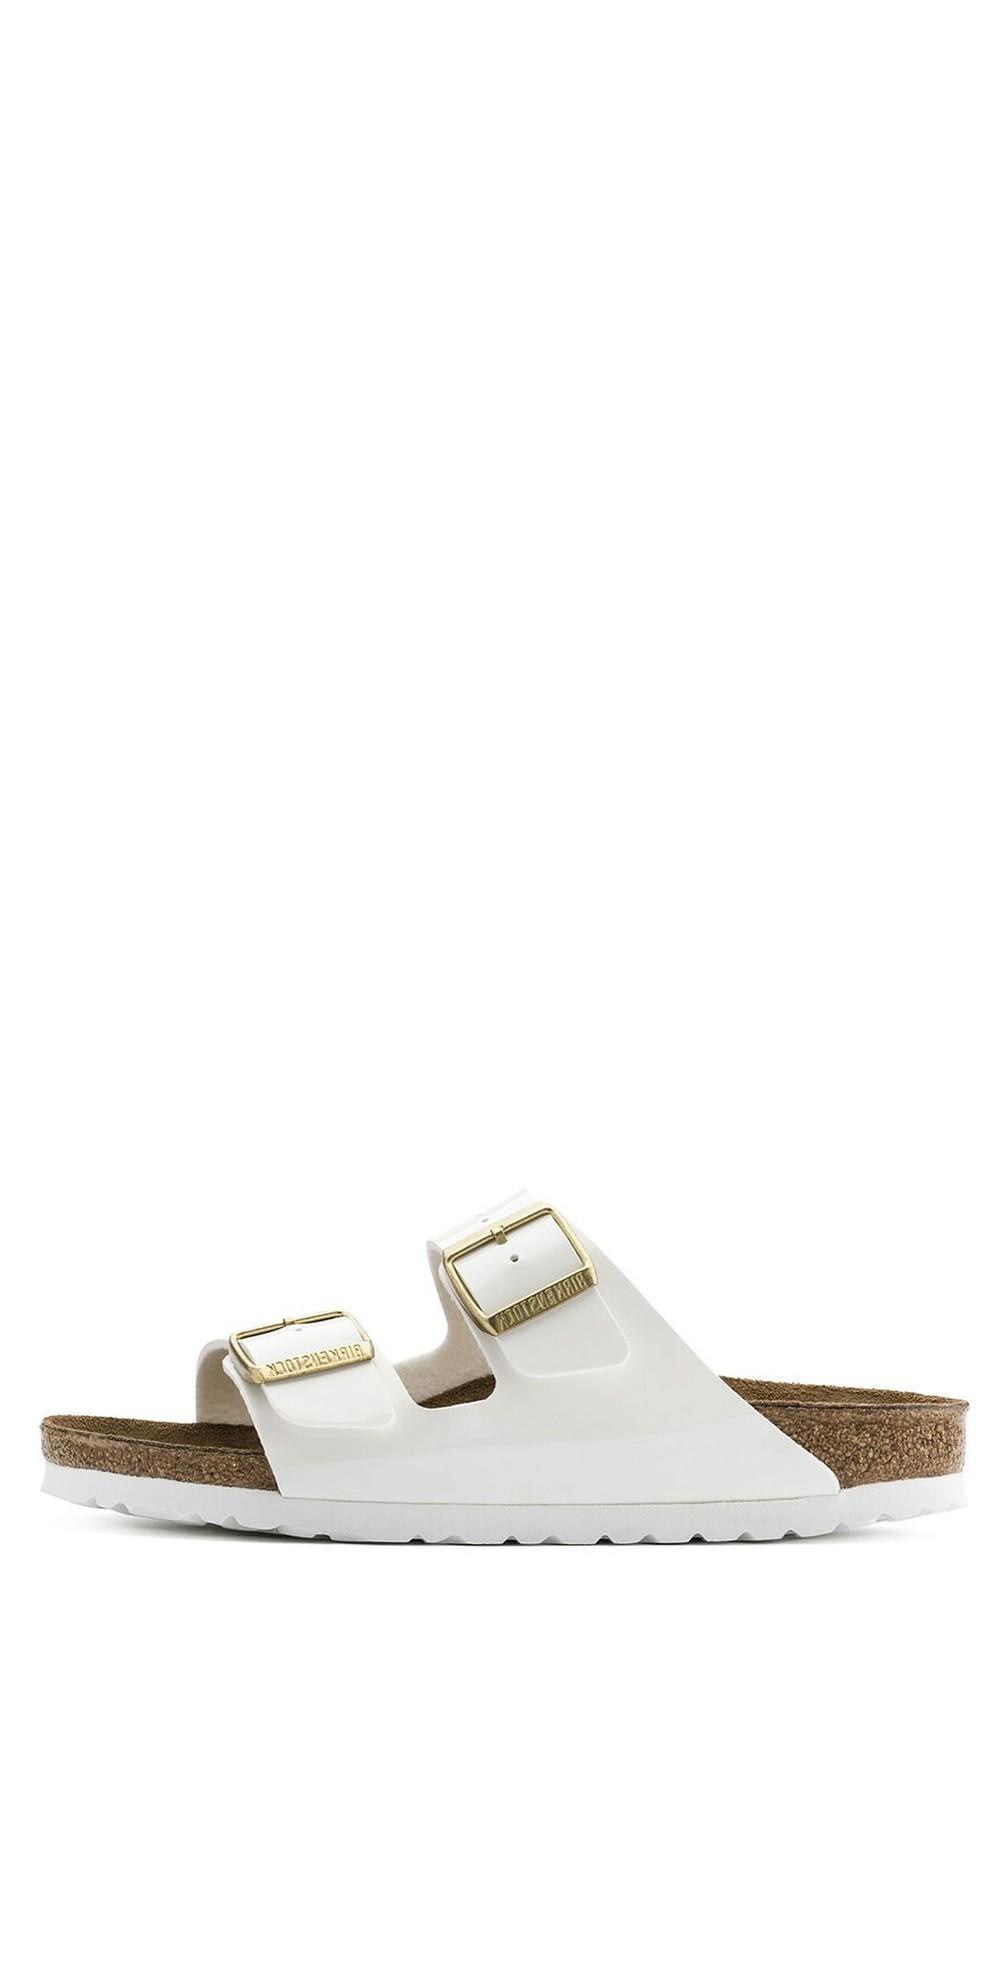 Arizona White Patent Birko-Flor® Sandal main image